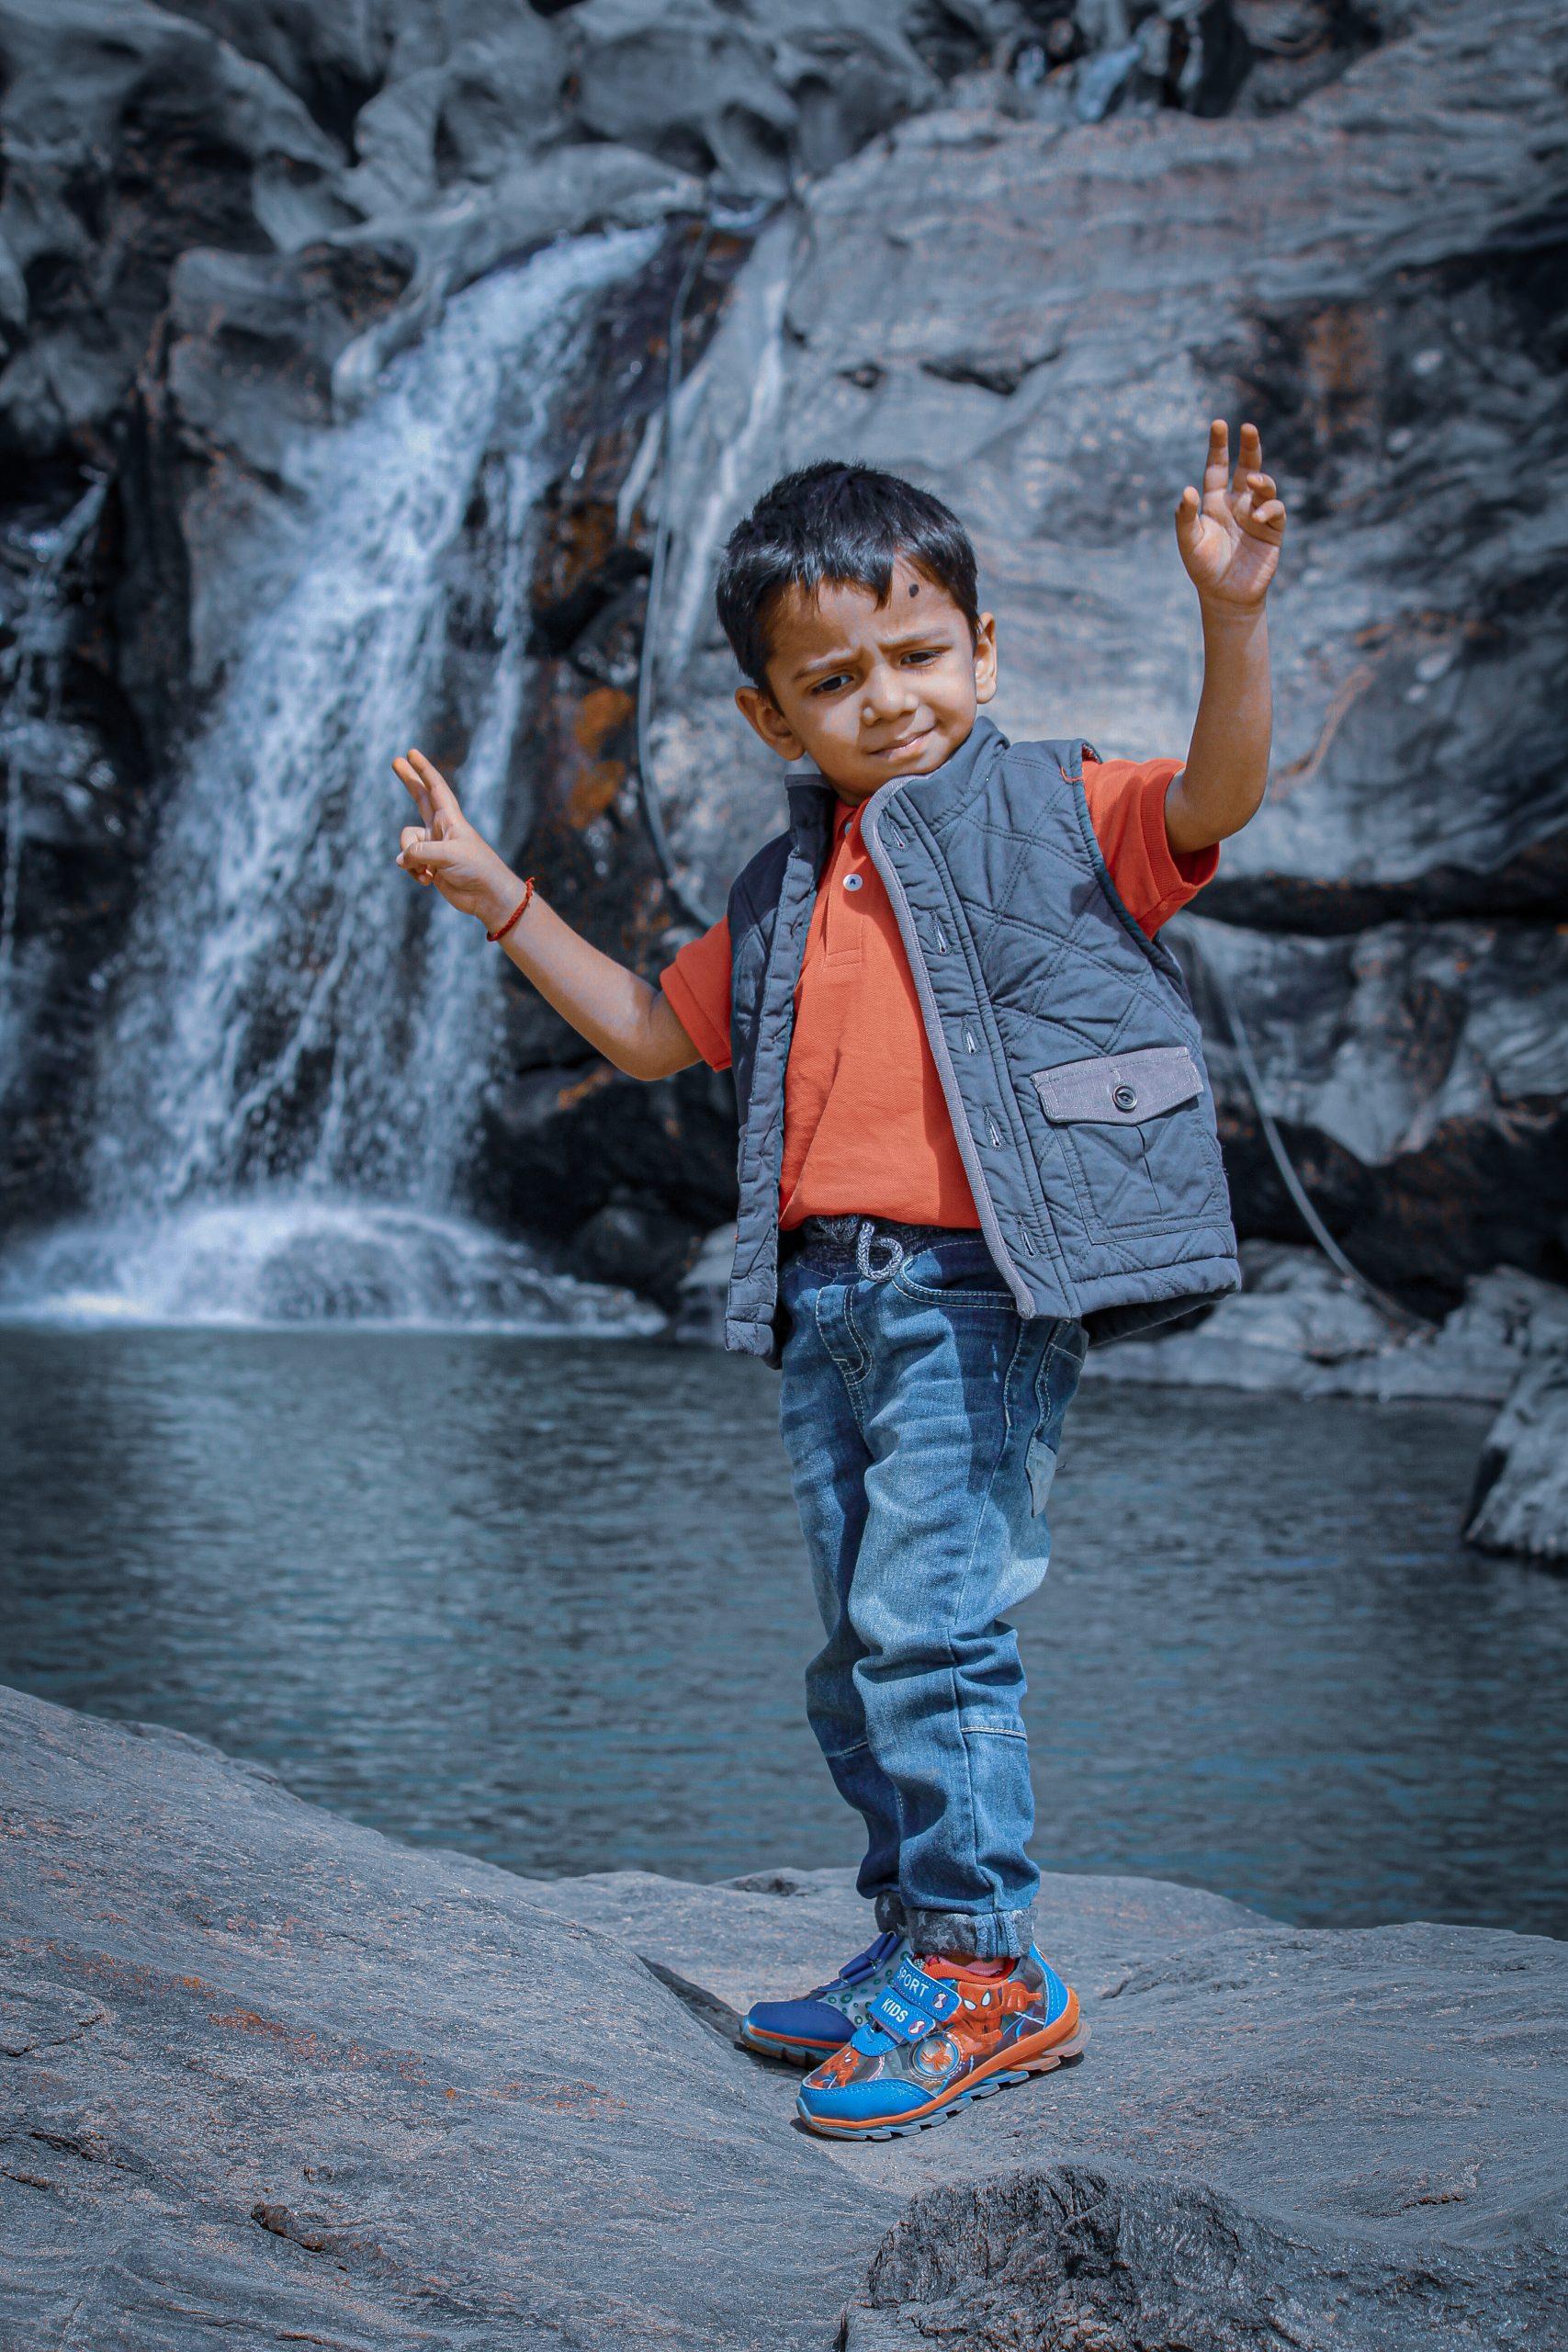 A stylish kid dancing near a waterfall